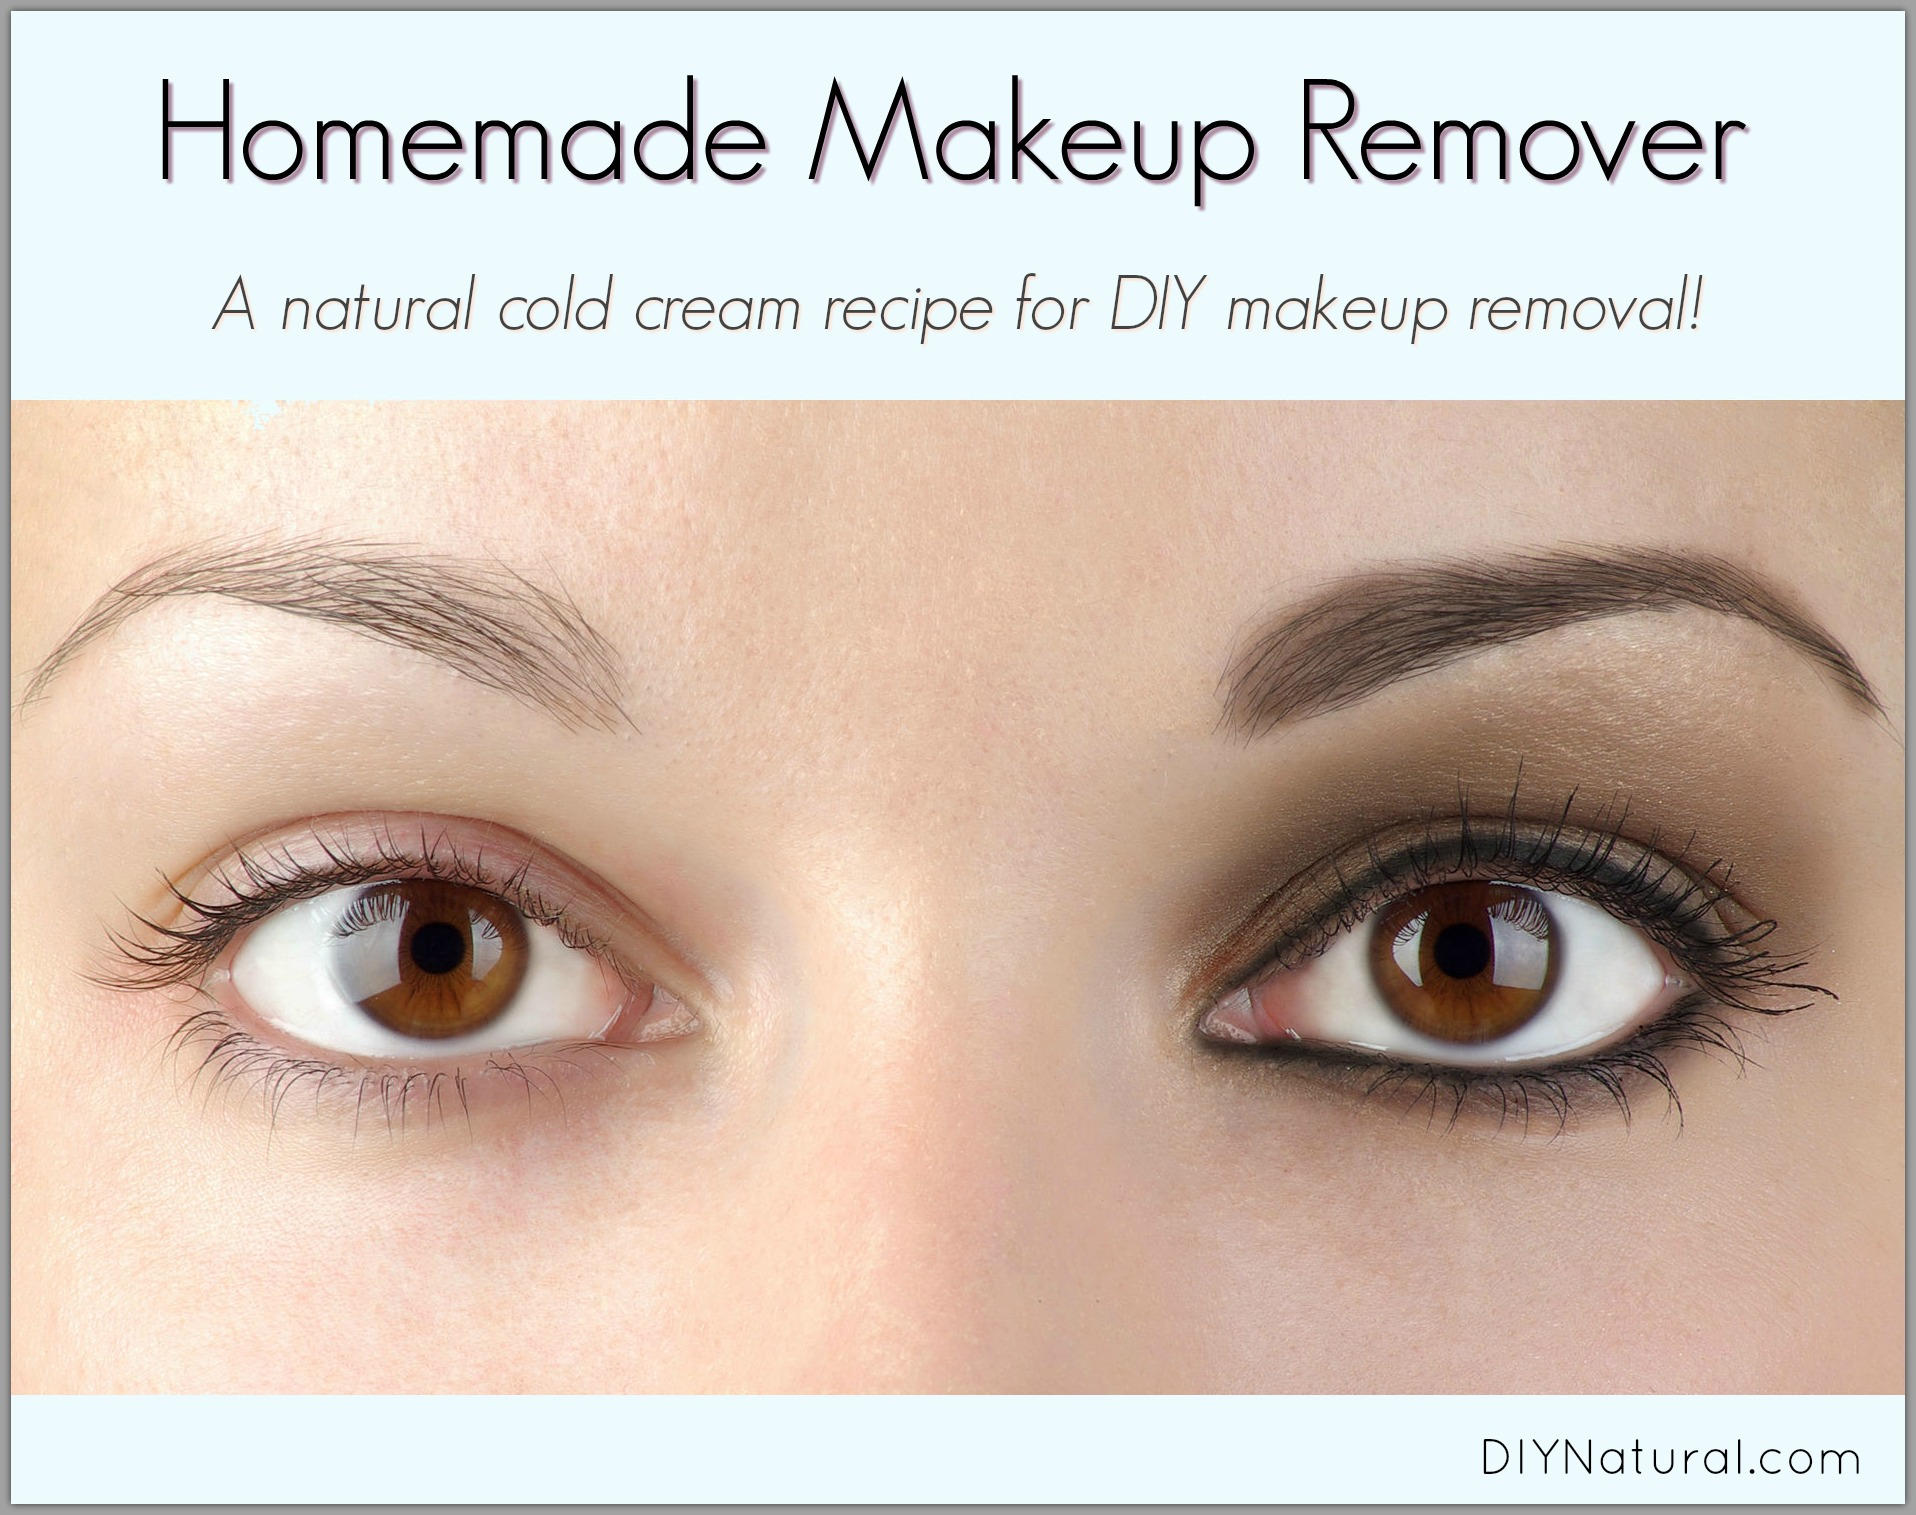 Homemade Makeup Remover: A Natural Cold Cream for DIY Makeup